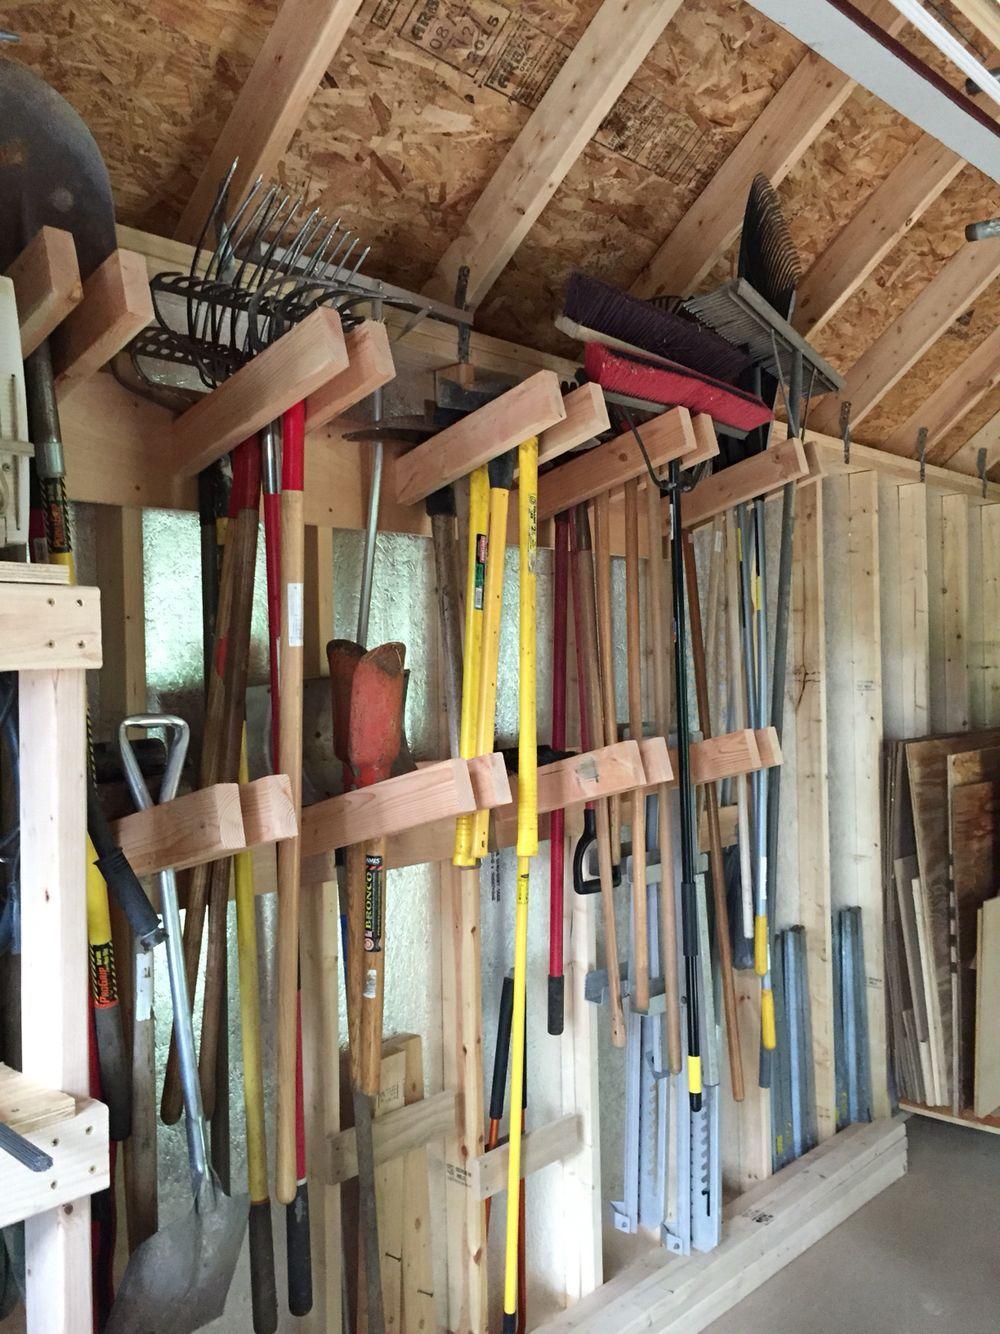 37 Stunning Smart Garage Storage Decorating For Your Inspirations In 2020 Storage Shed Organization Diy Shed Plans Shed Storage